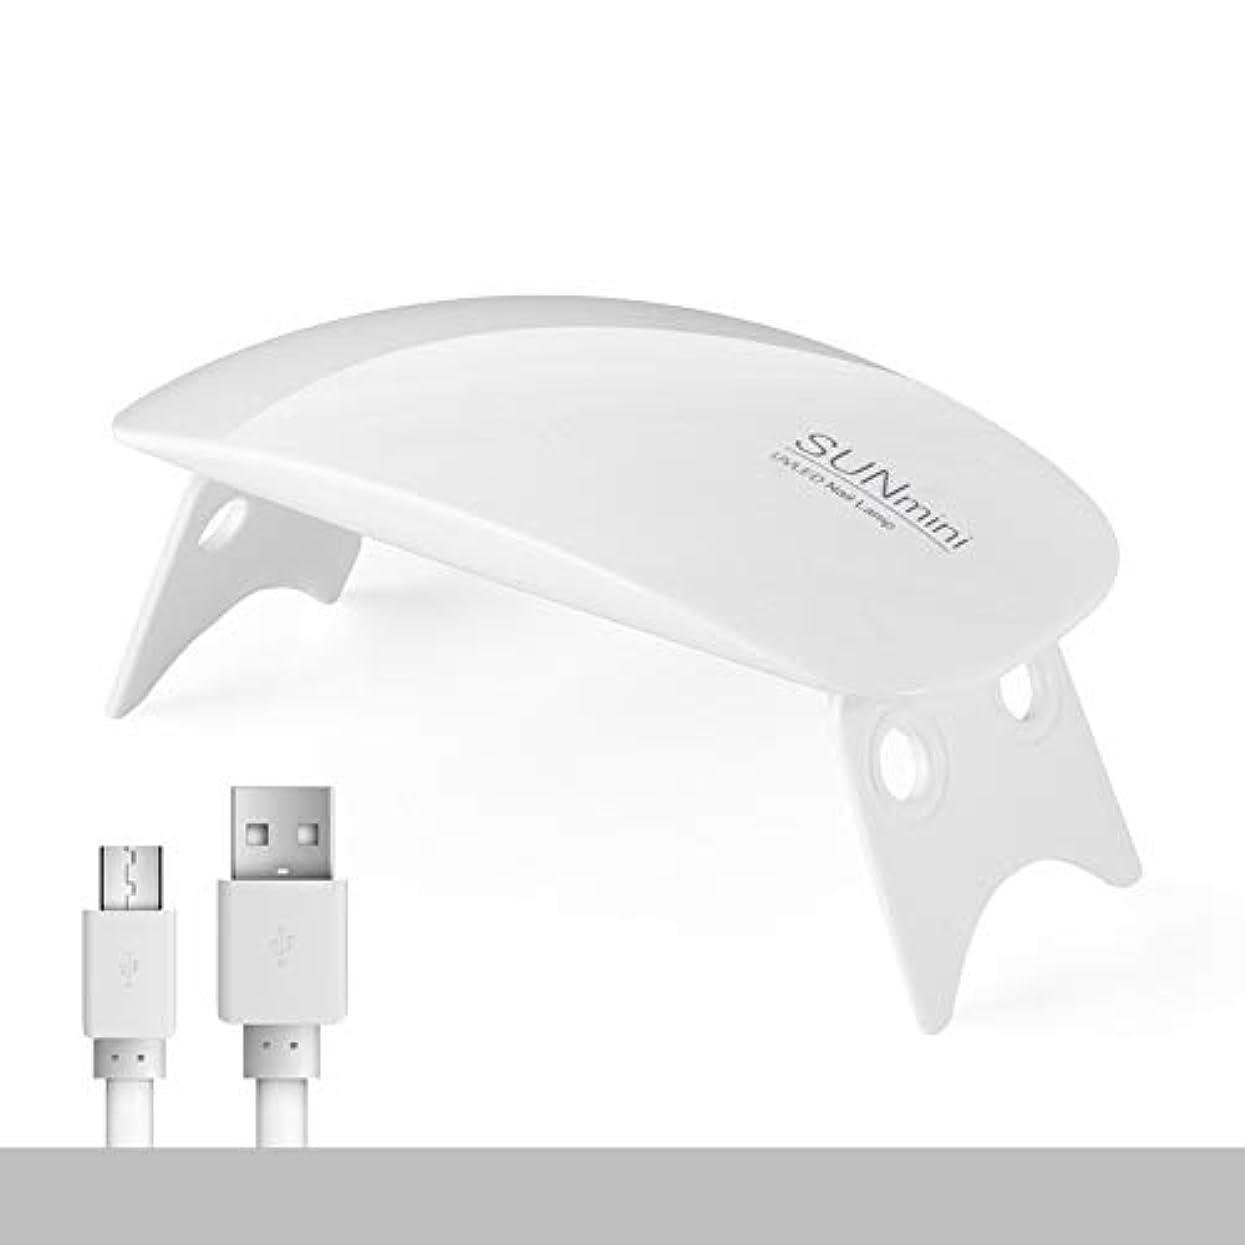 UVライト LEDネイルドライヤー ジェルネイルLEDライト 硬化ライト タイマー設定可能 折りたたみ式手足とも使える 人感センサー式 UV と LEDダブルライト ジェルネイル用 (白)